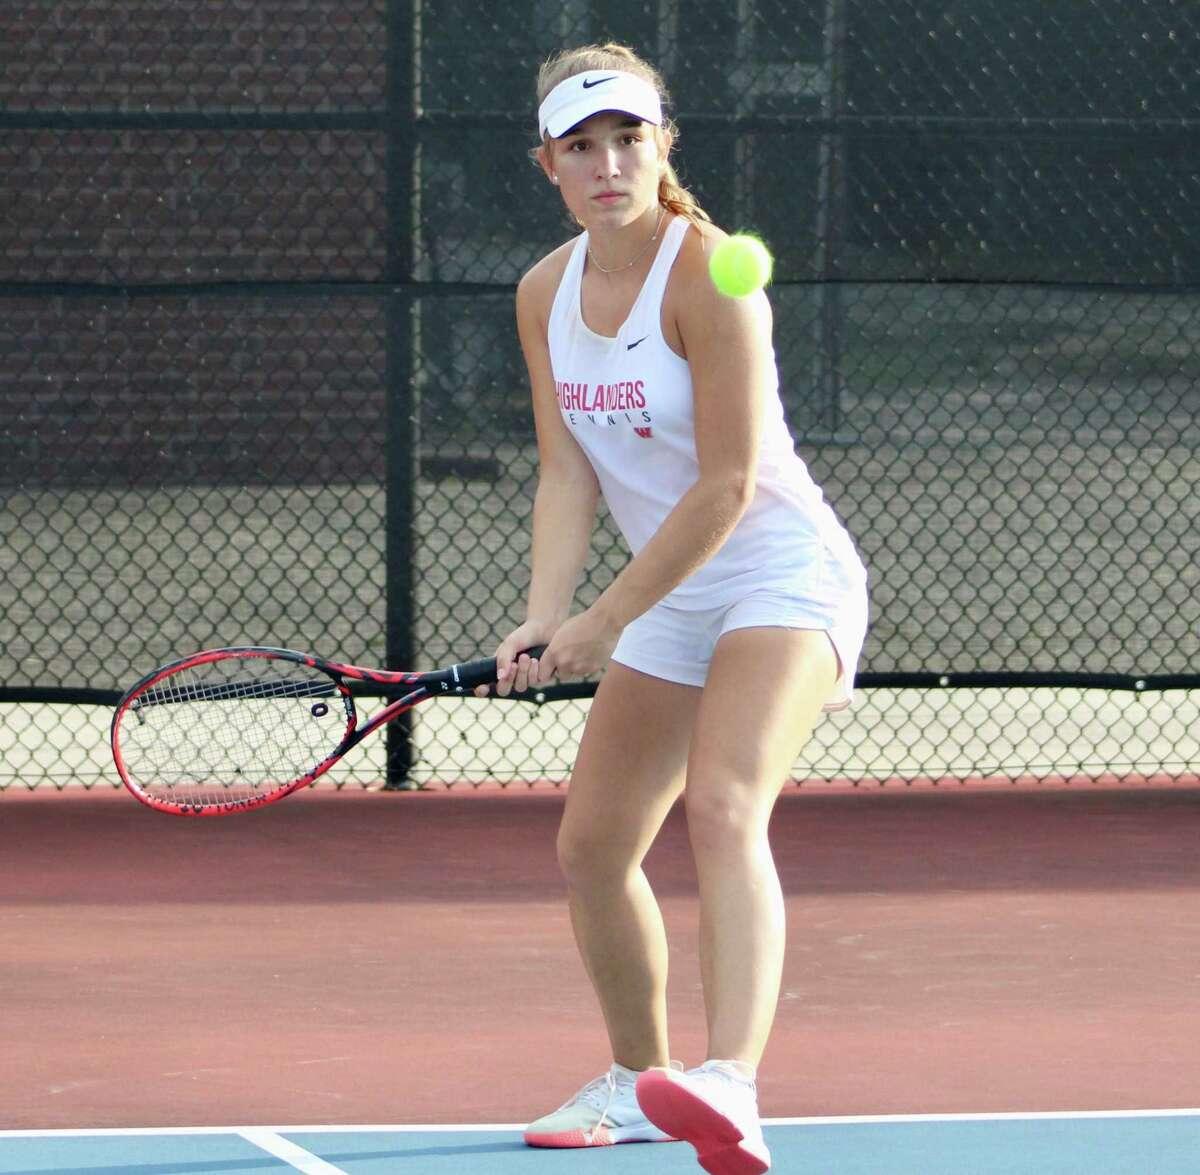 The Woodlands tennis player Emma Samuelsson.